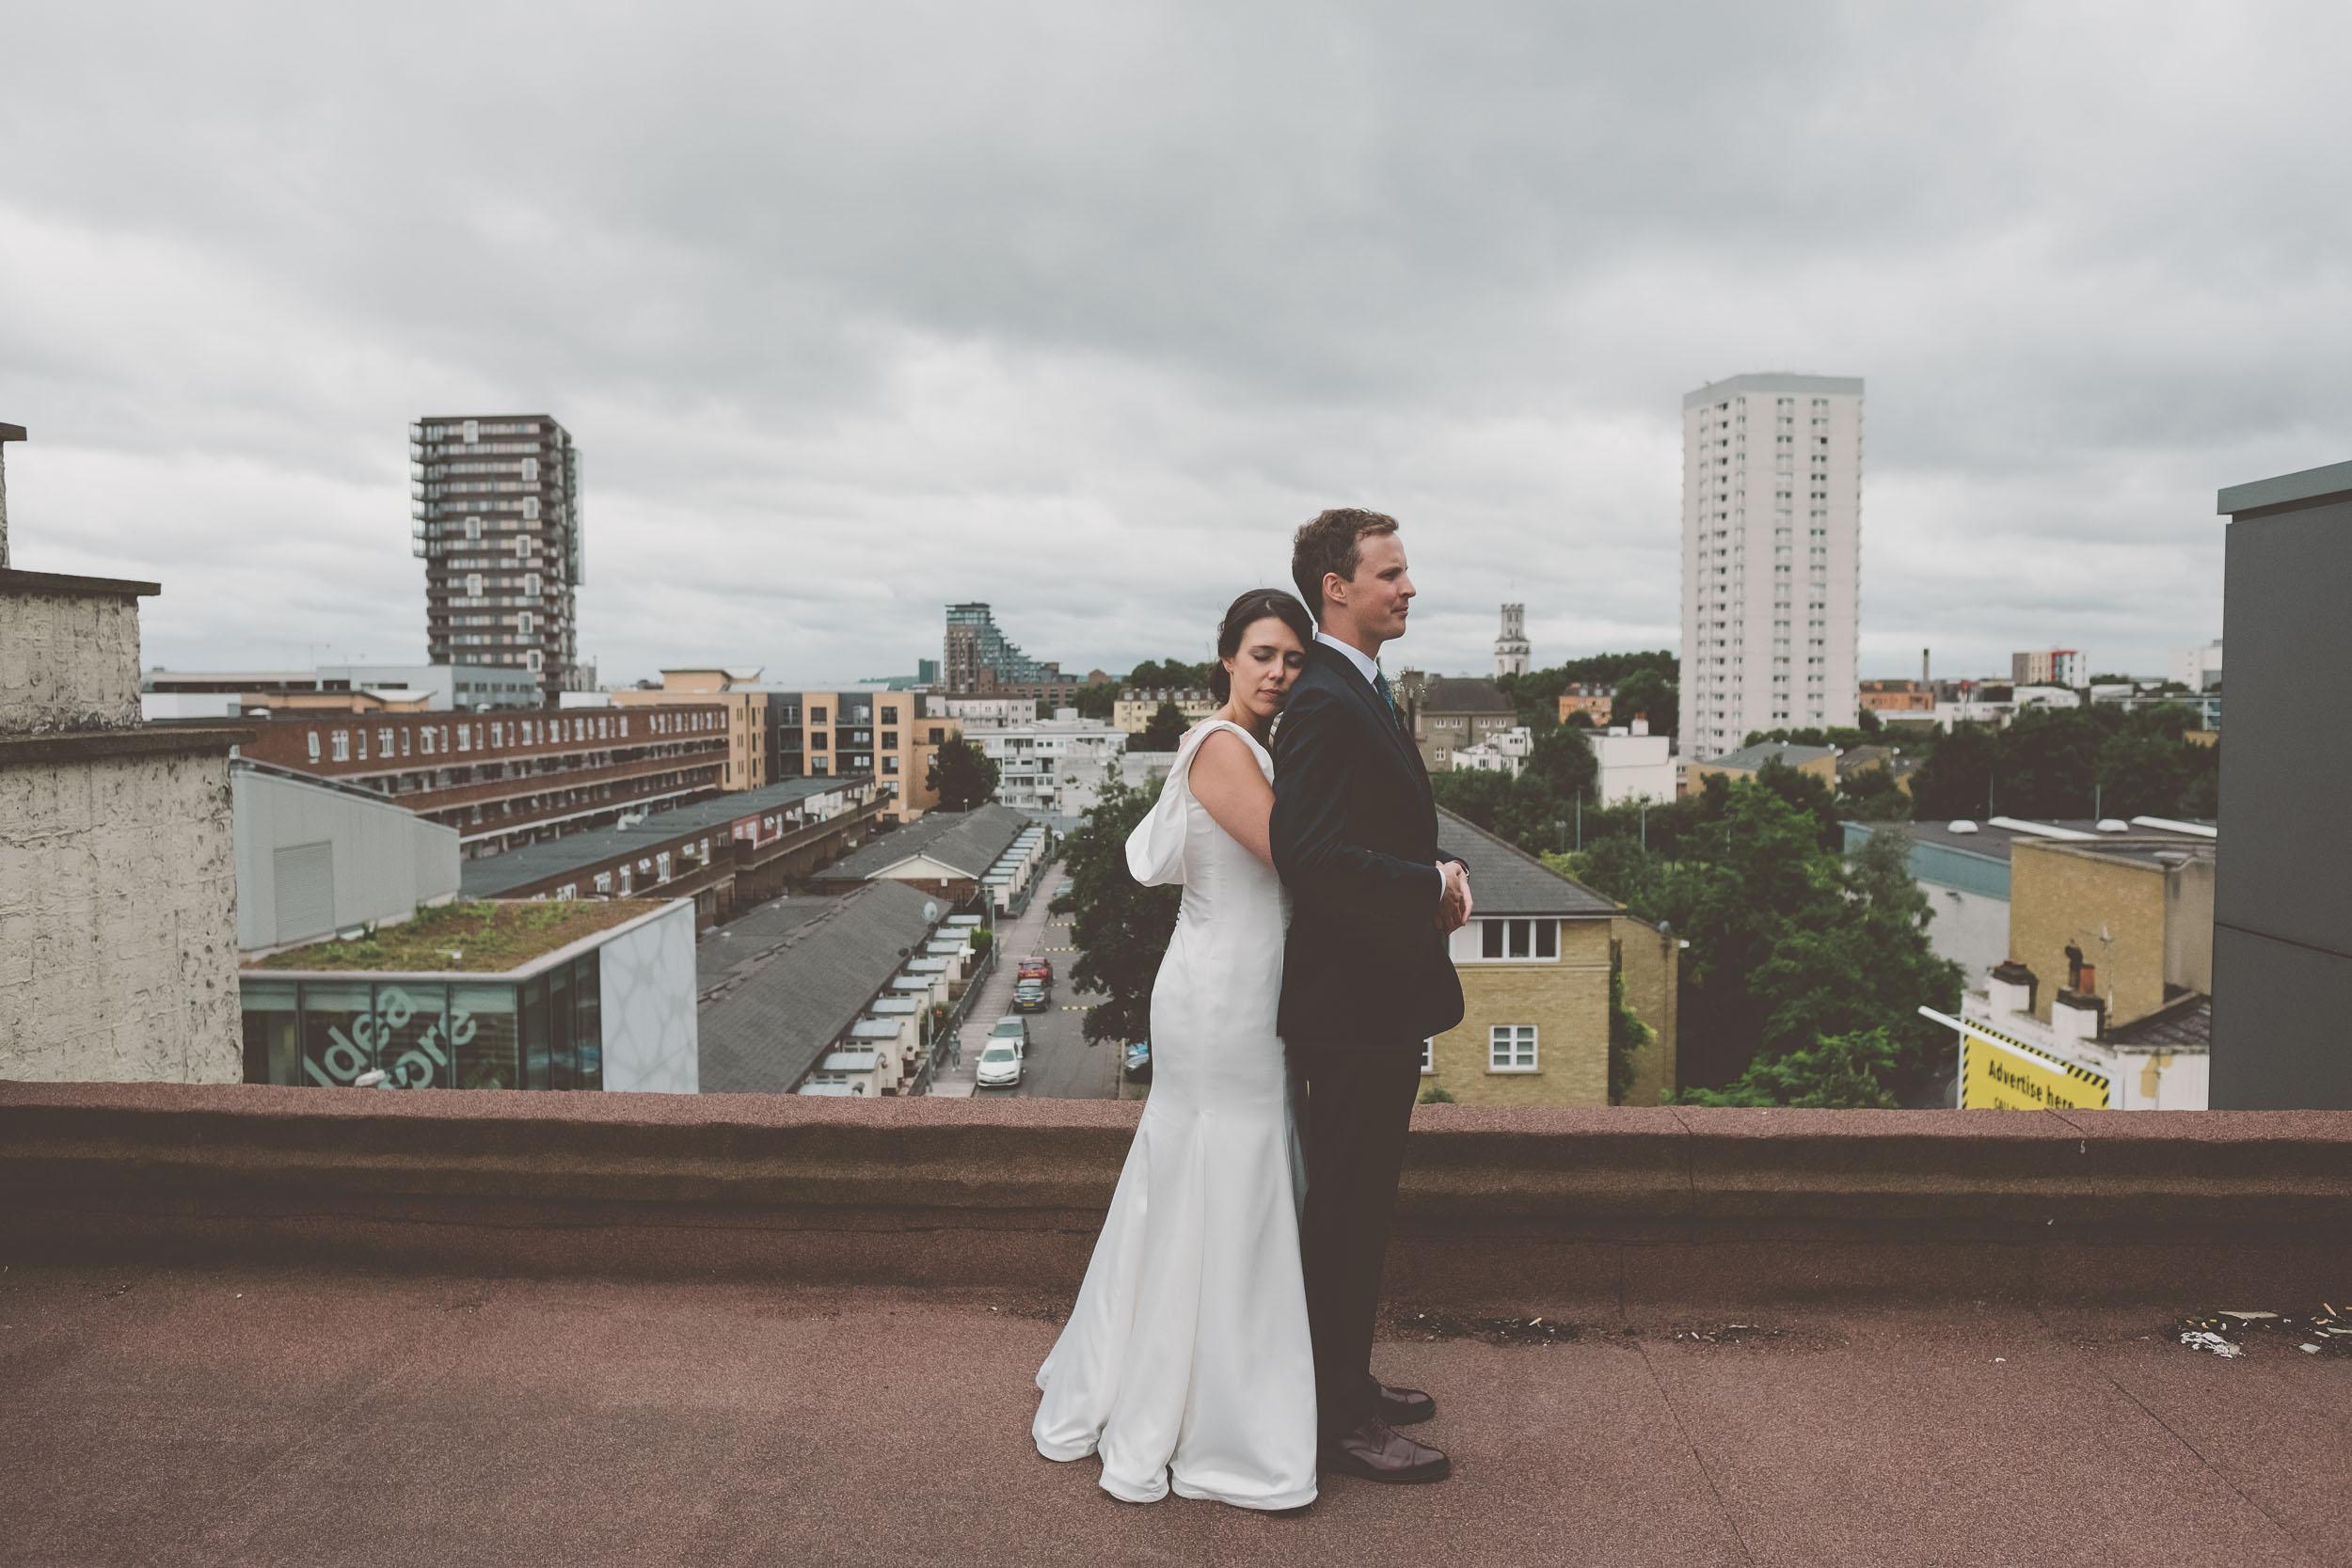 islington-town-hall-4th-floor-studios-wedding288.jpg